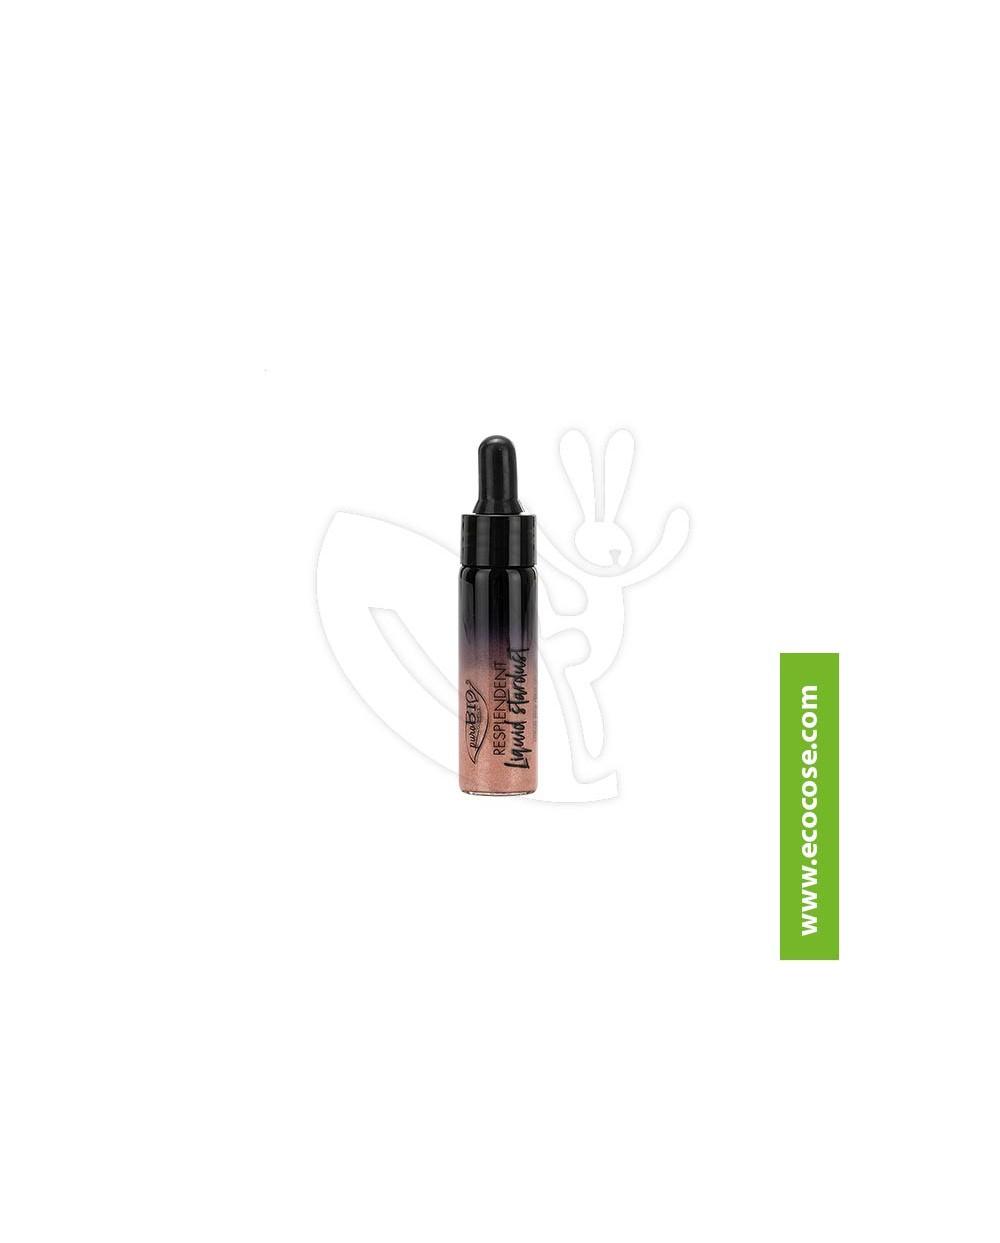 PuroBIO Cosmetics - Resplendent - Liquid Stardust highlighter 02 Oro Rosa